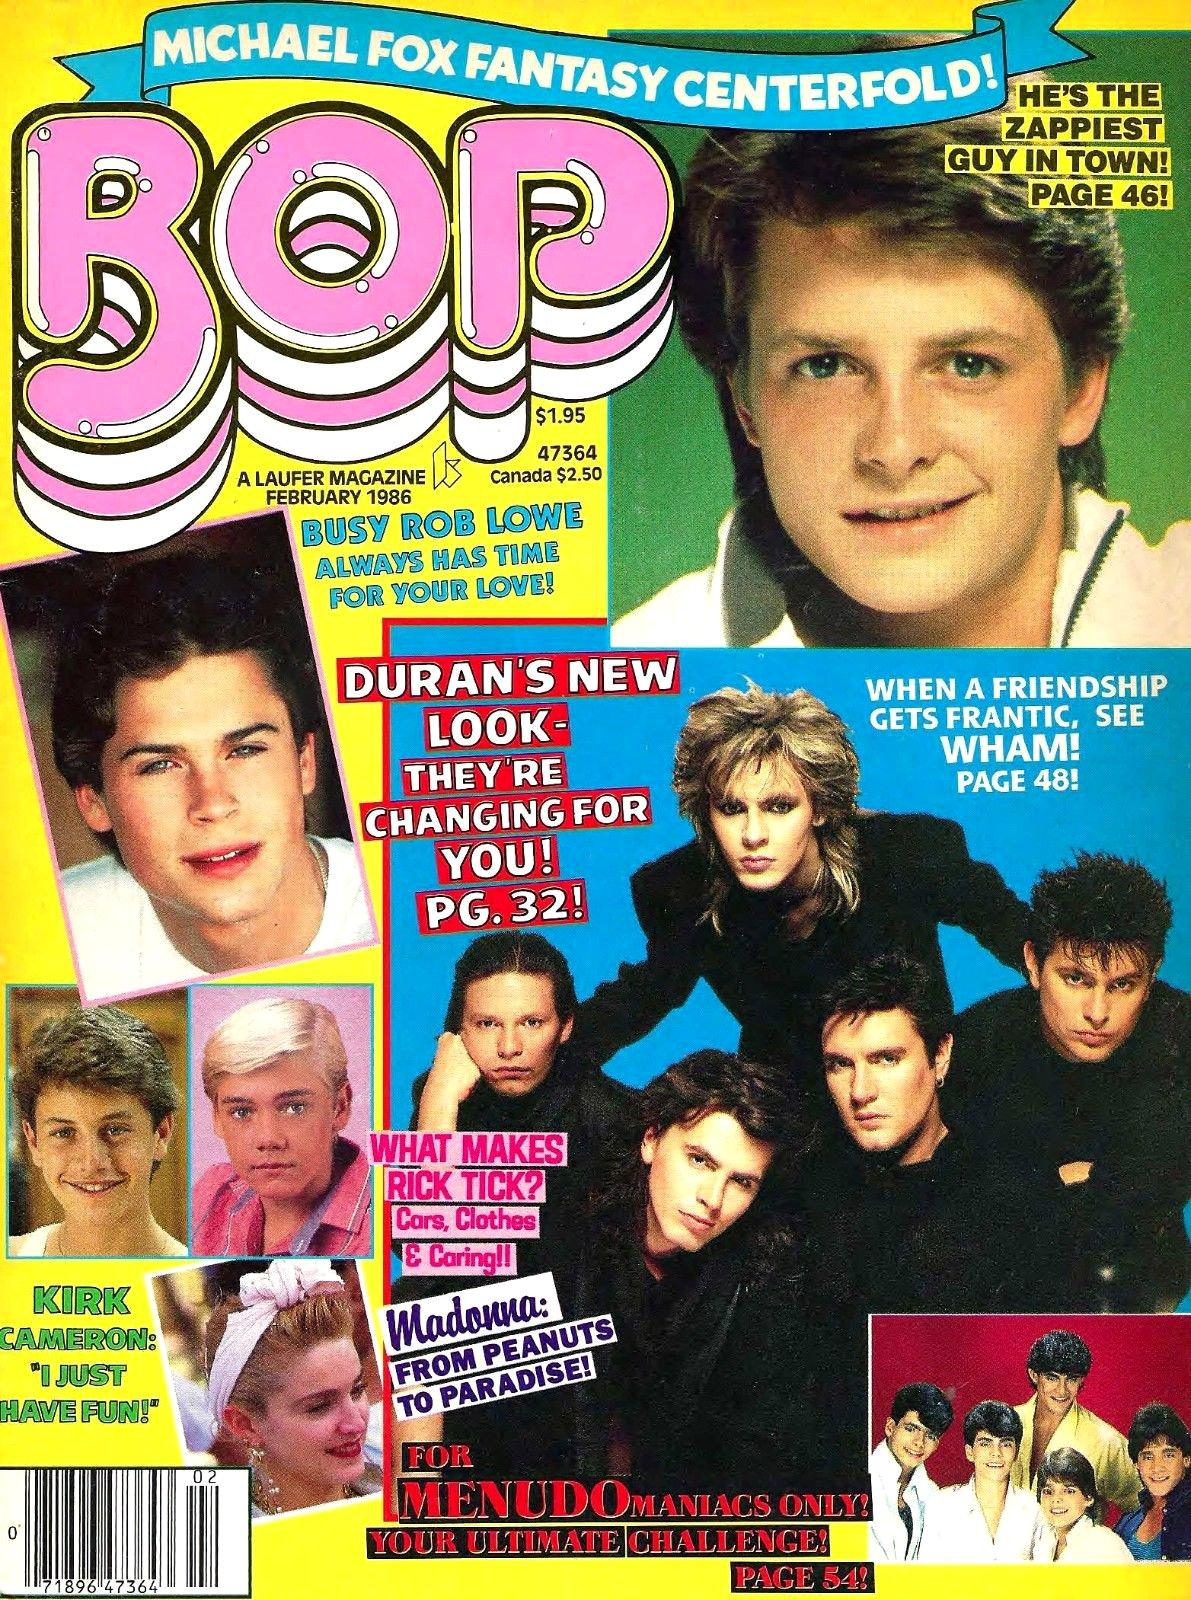 image bop teen magazine madonna menudo kirk cameron